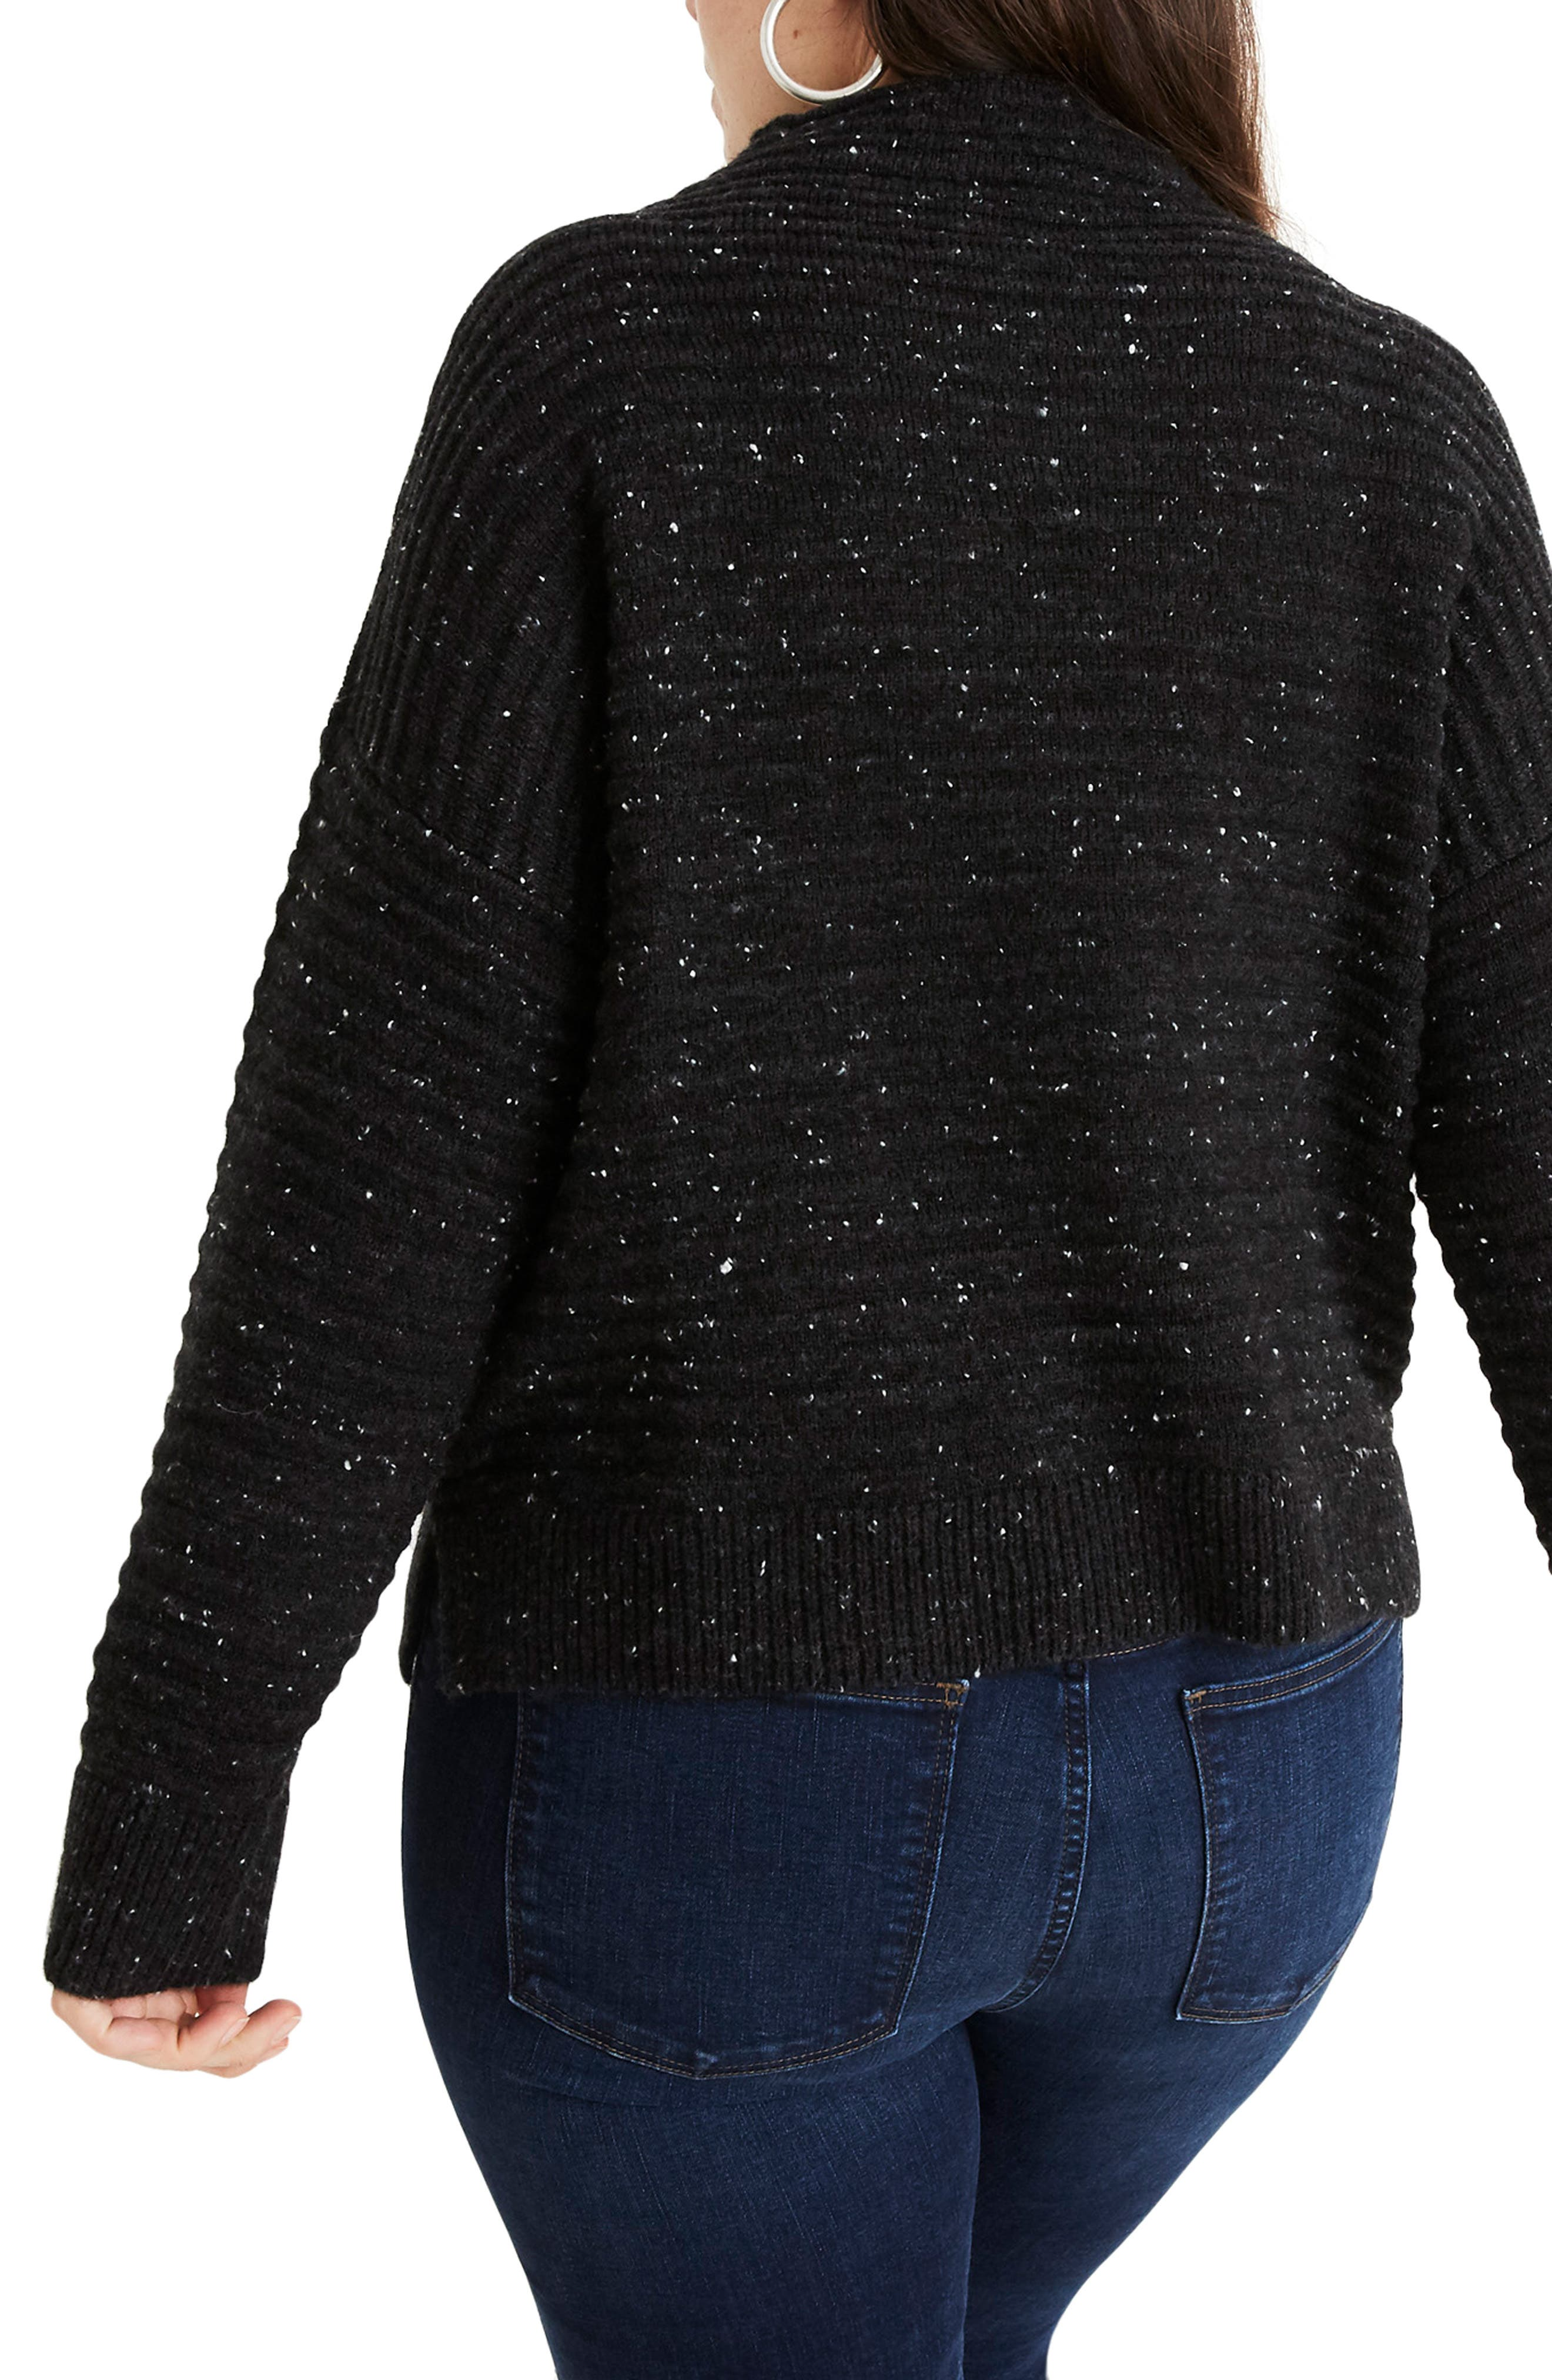 Belmont Donegal Mock Neck Sweater,                             Alternate thumbnail 7, color,                             DONEGAL STORM